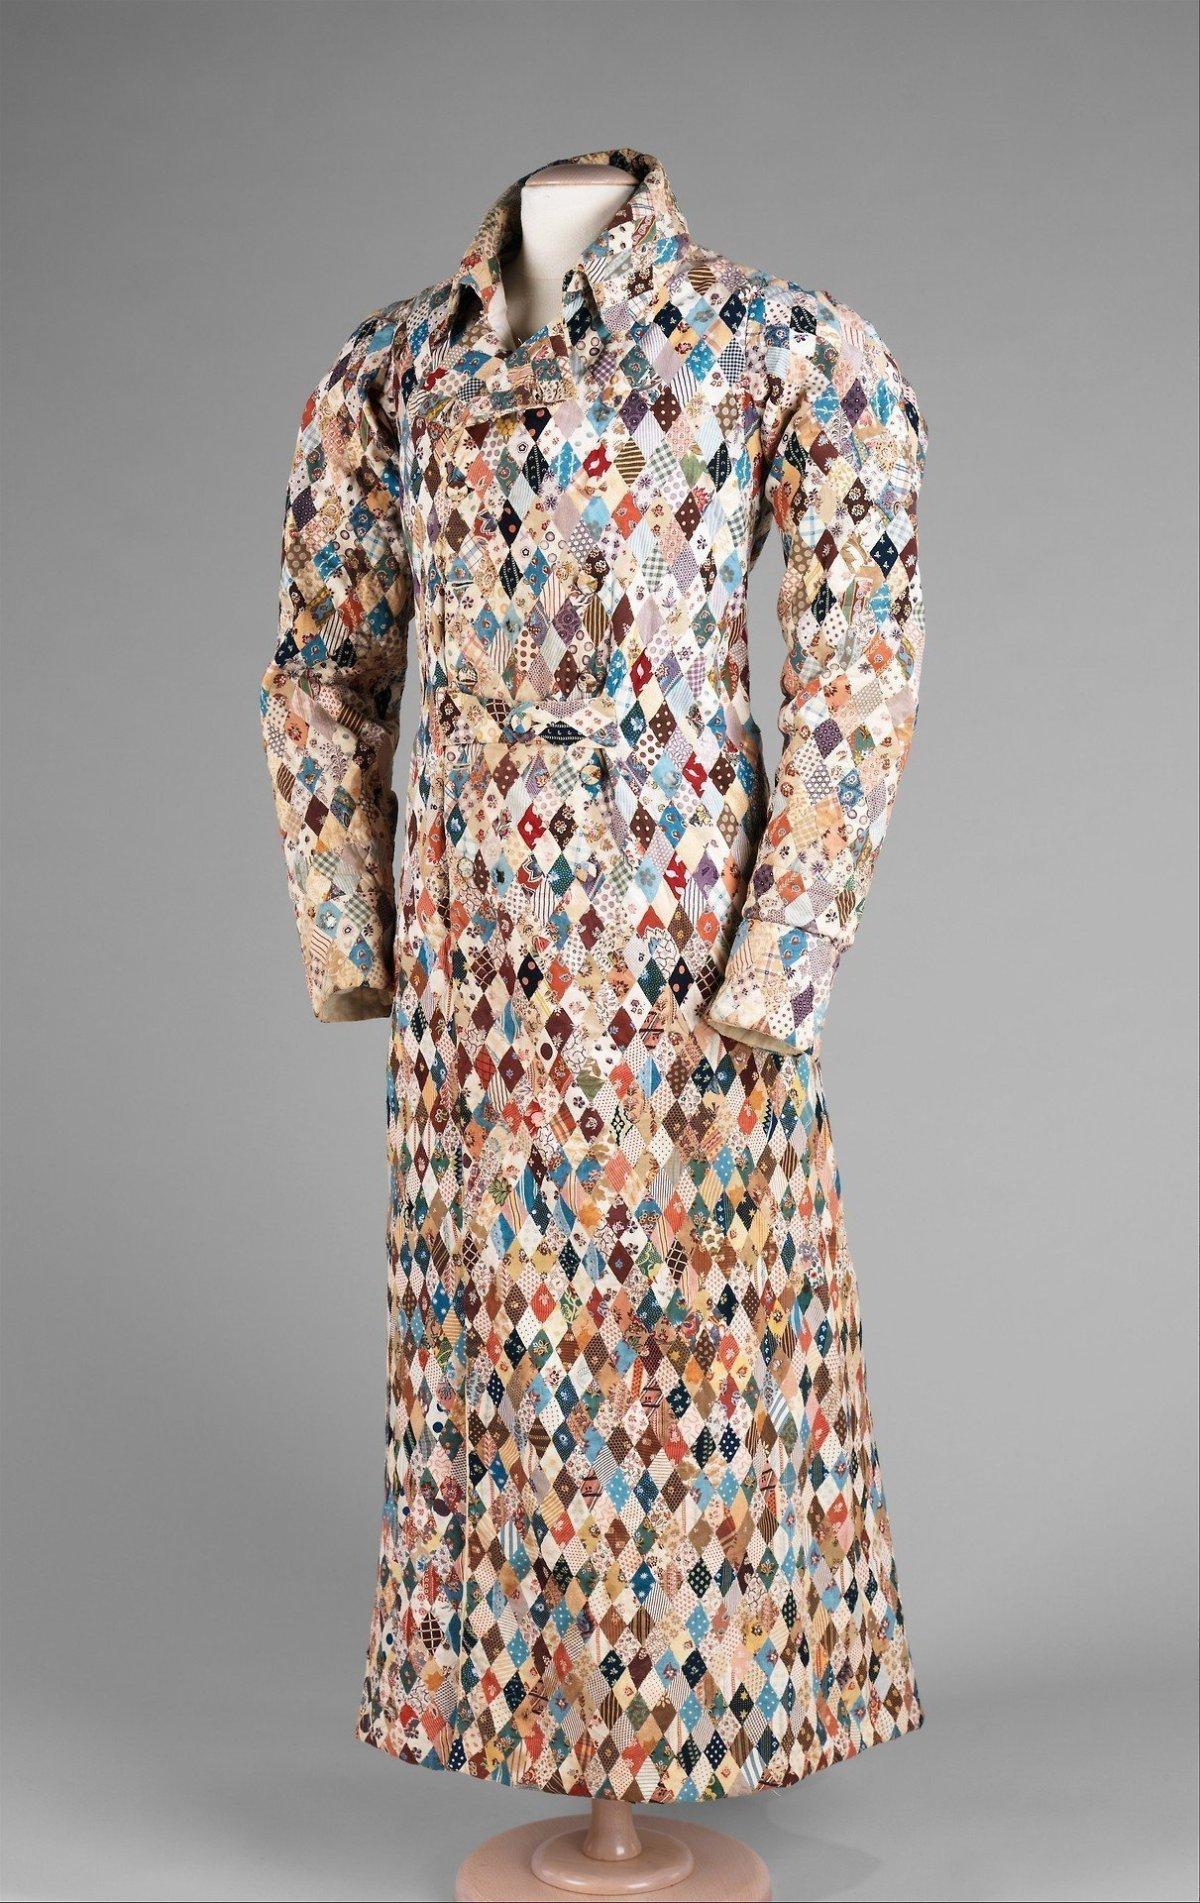 18th century - Robe